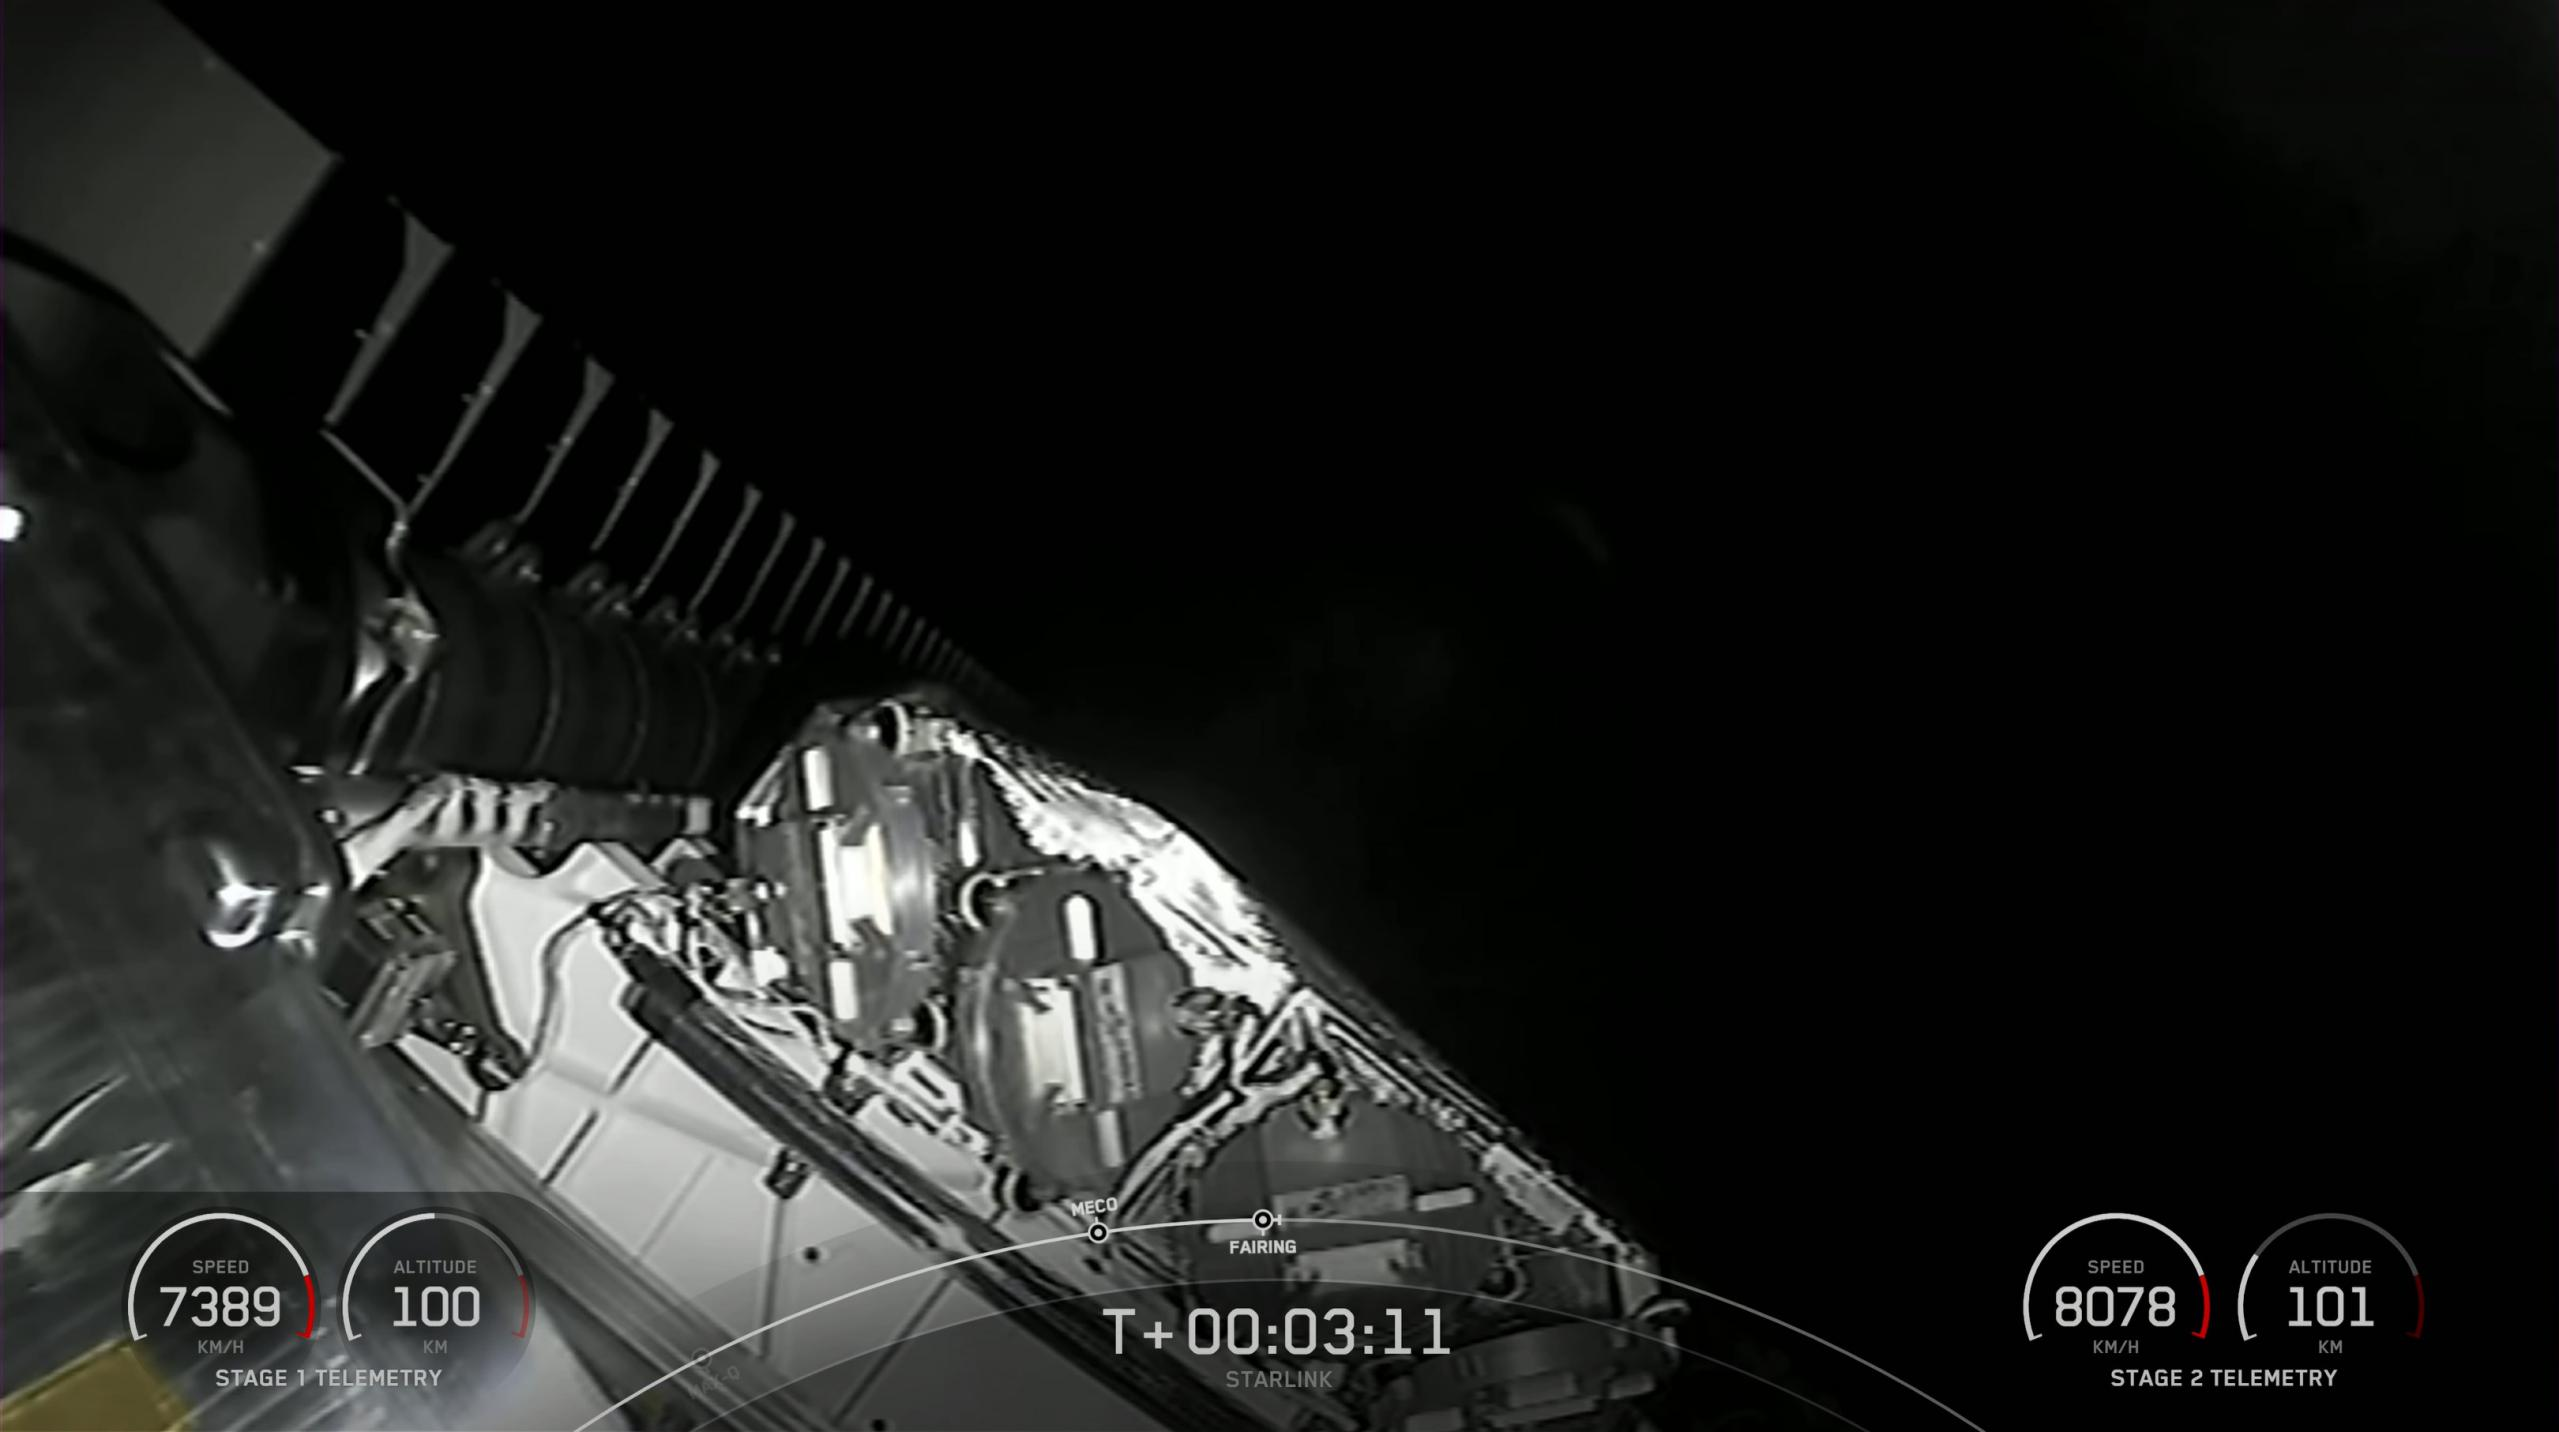 Starlink 2-1 V1.5 F9 B1049 091321 webcast (SpaceX) satellites 1 (c)